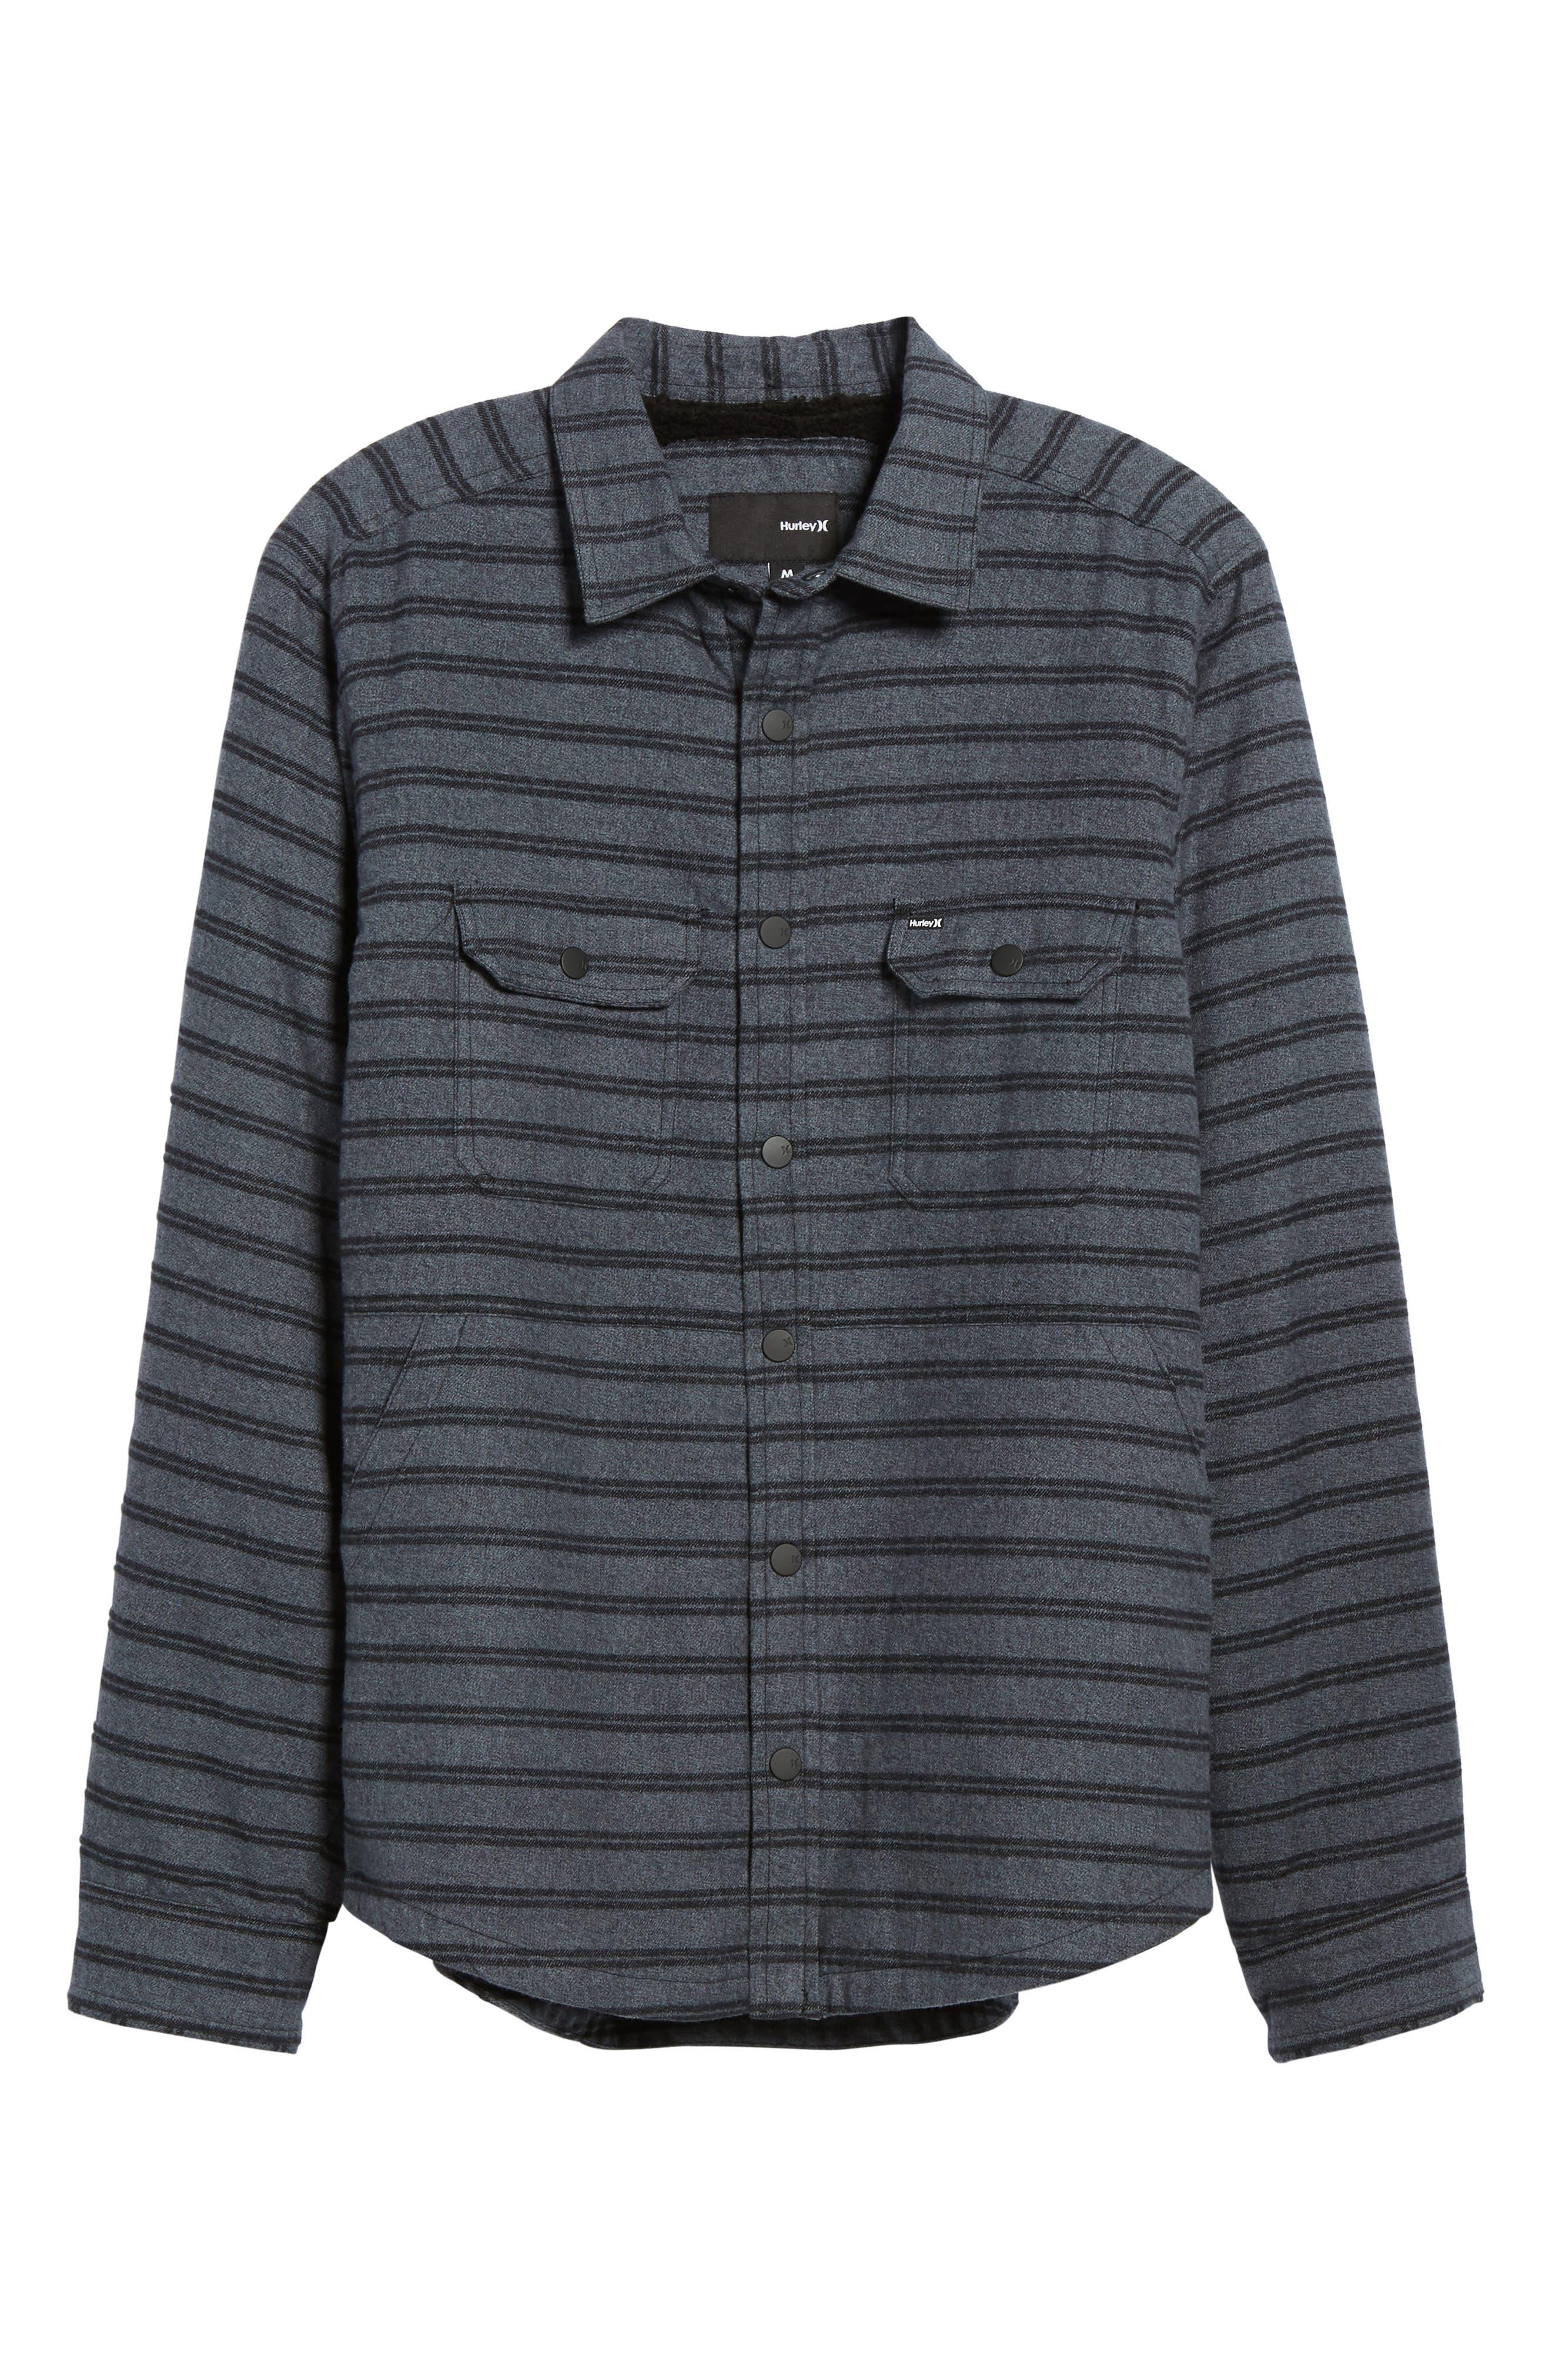 Dispatch Shirt Jacket,                             Alternate thumbnail 6, color,                             010